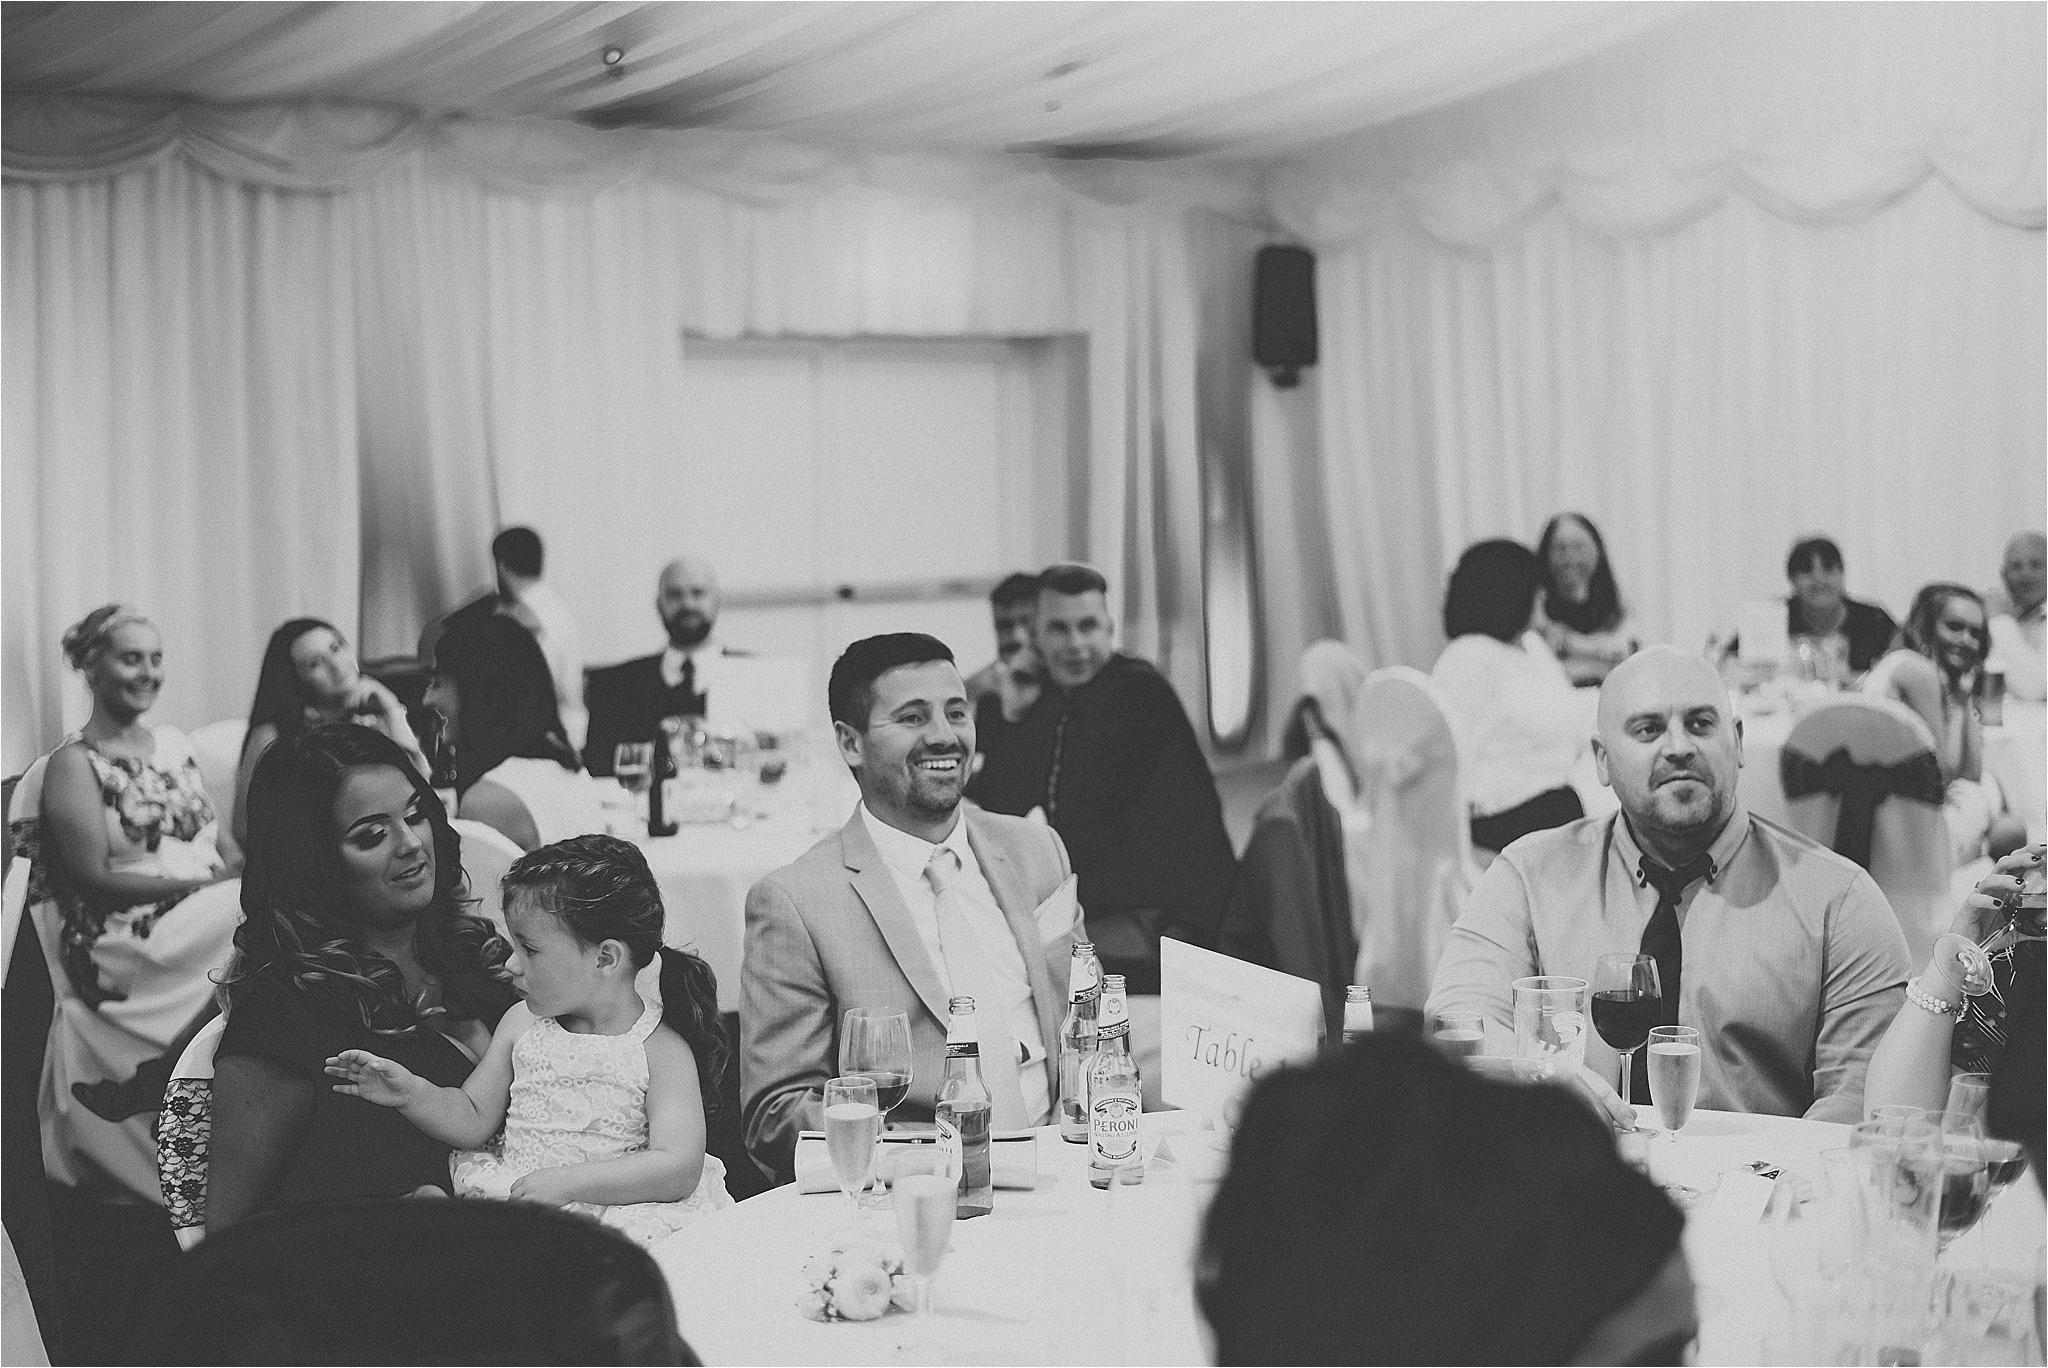 thevilla+lancashire+wreagreen+wedding+photographer46.jpg